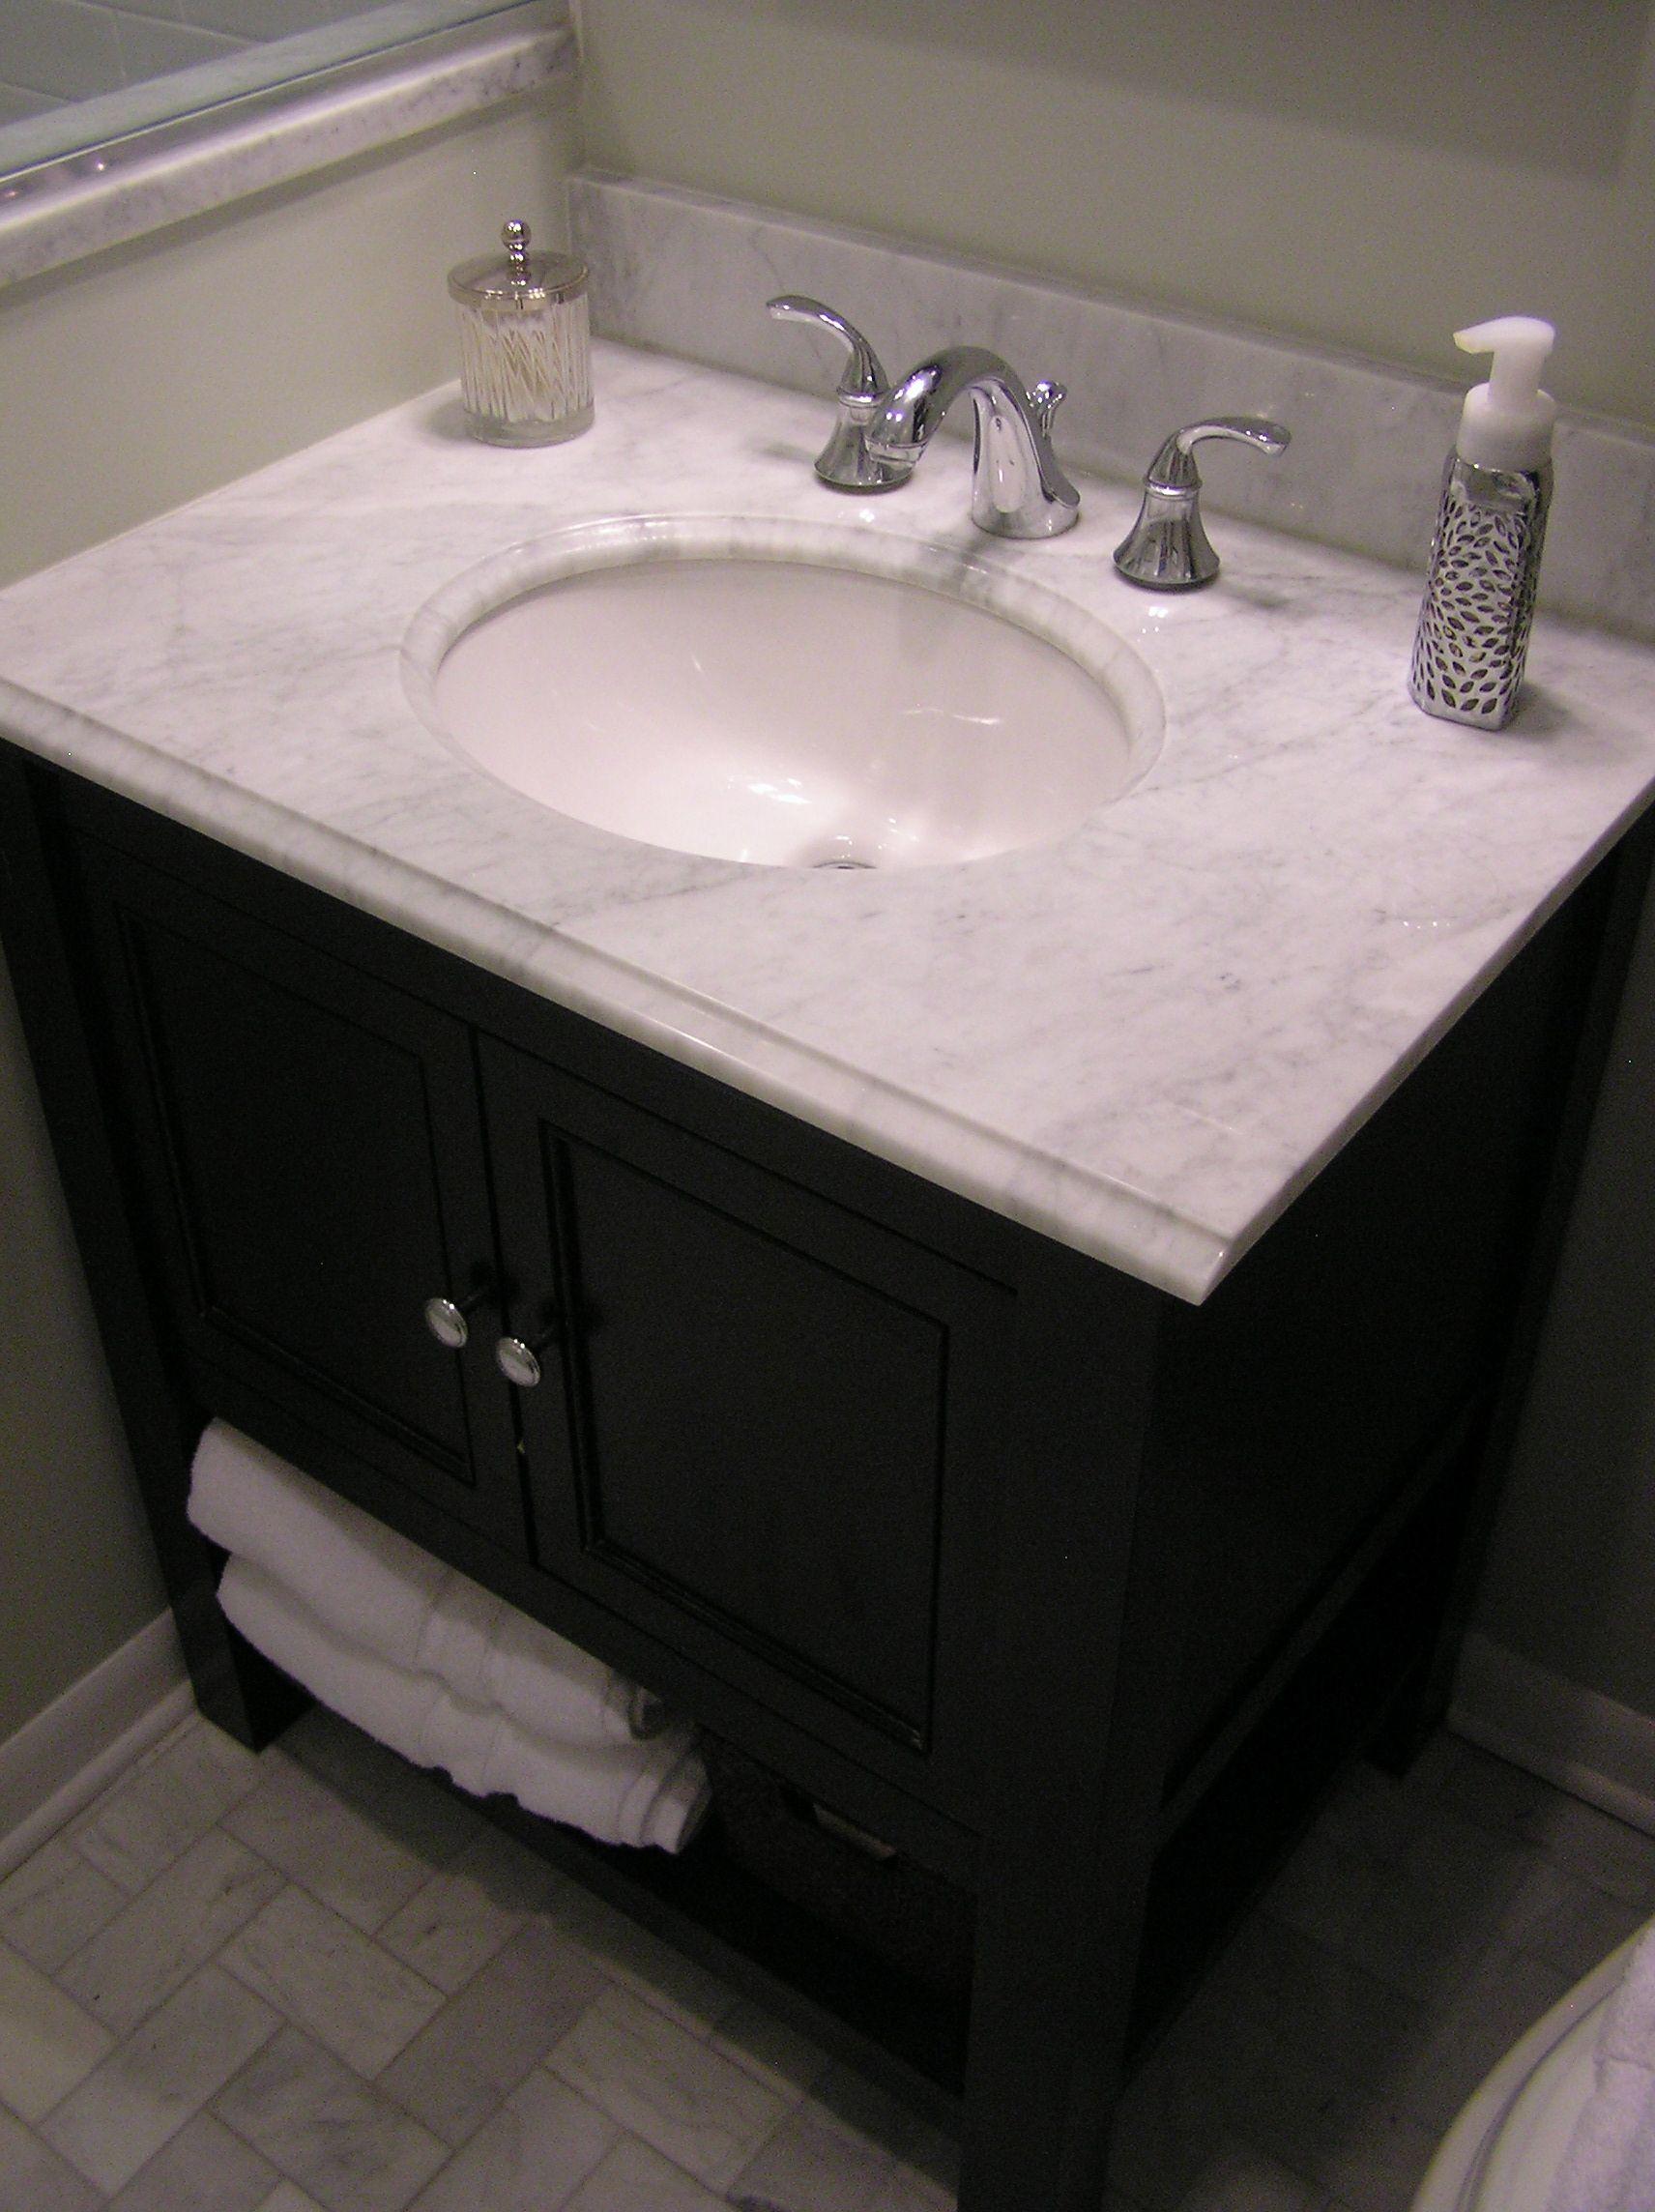 19 Amazing Costco Bathroom Vanities With Images Bathroom Vanity